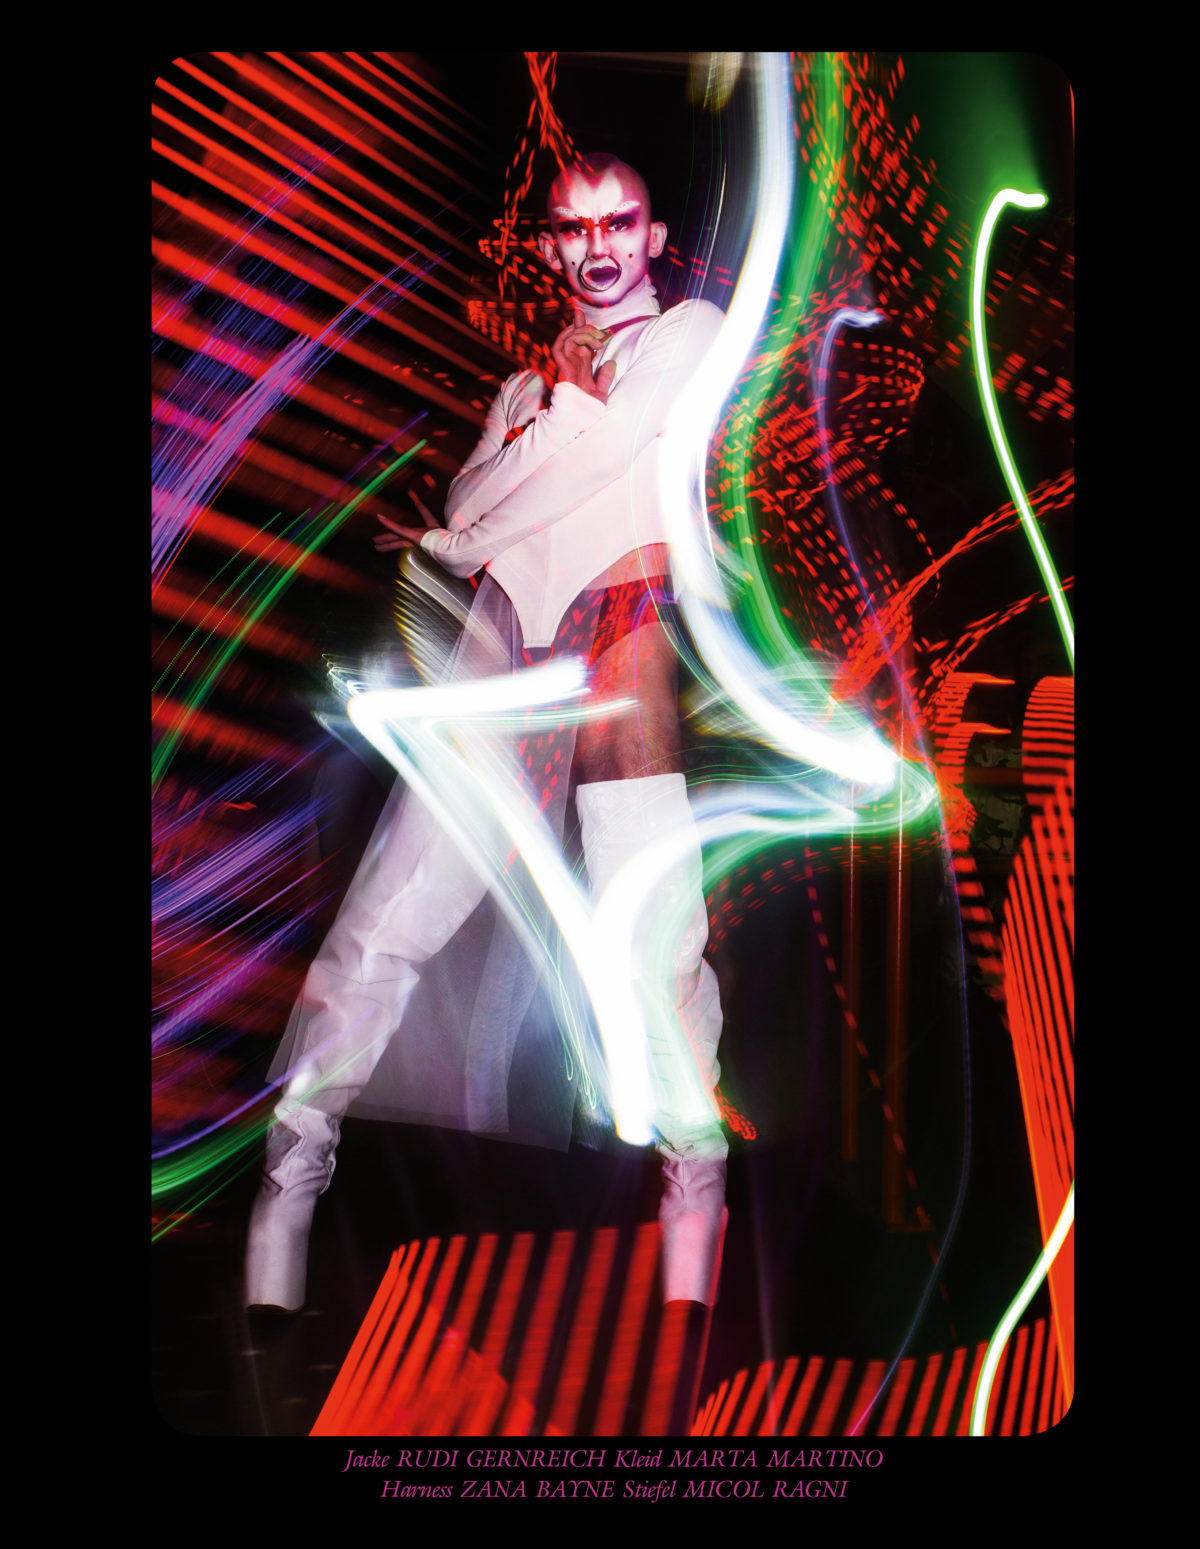 TUSH 44 Special Rudi Gernreich styled by Arthur Mayadoux shot by Pierrick Rocher